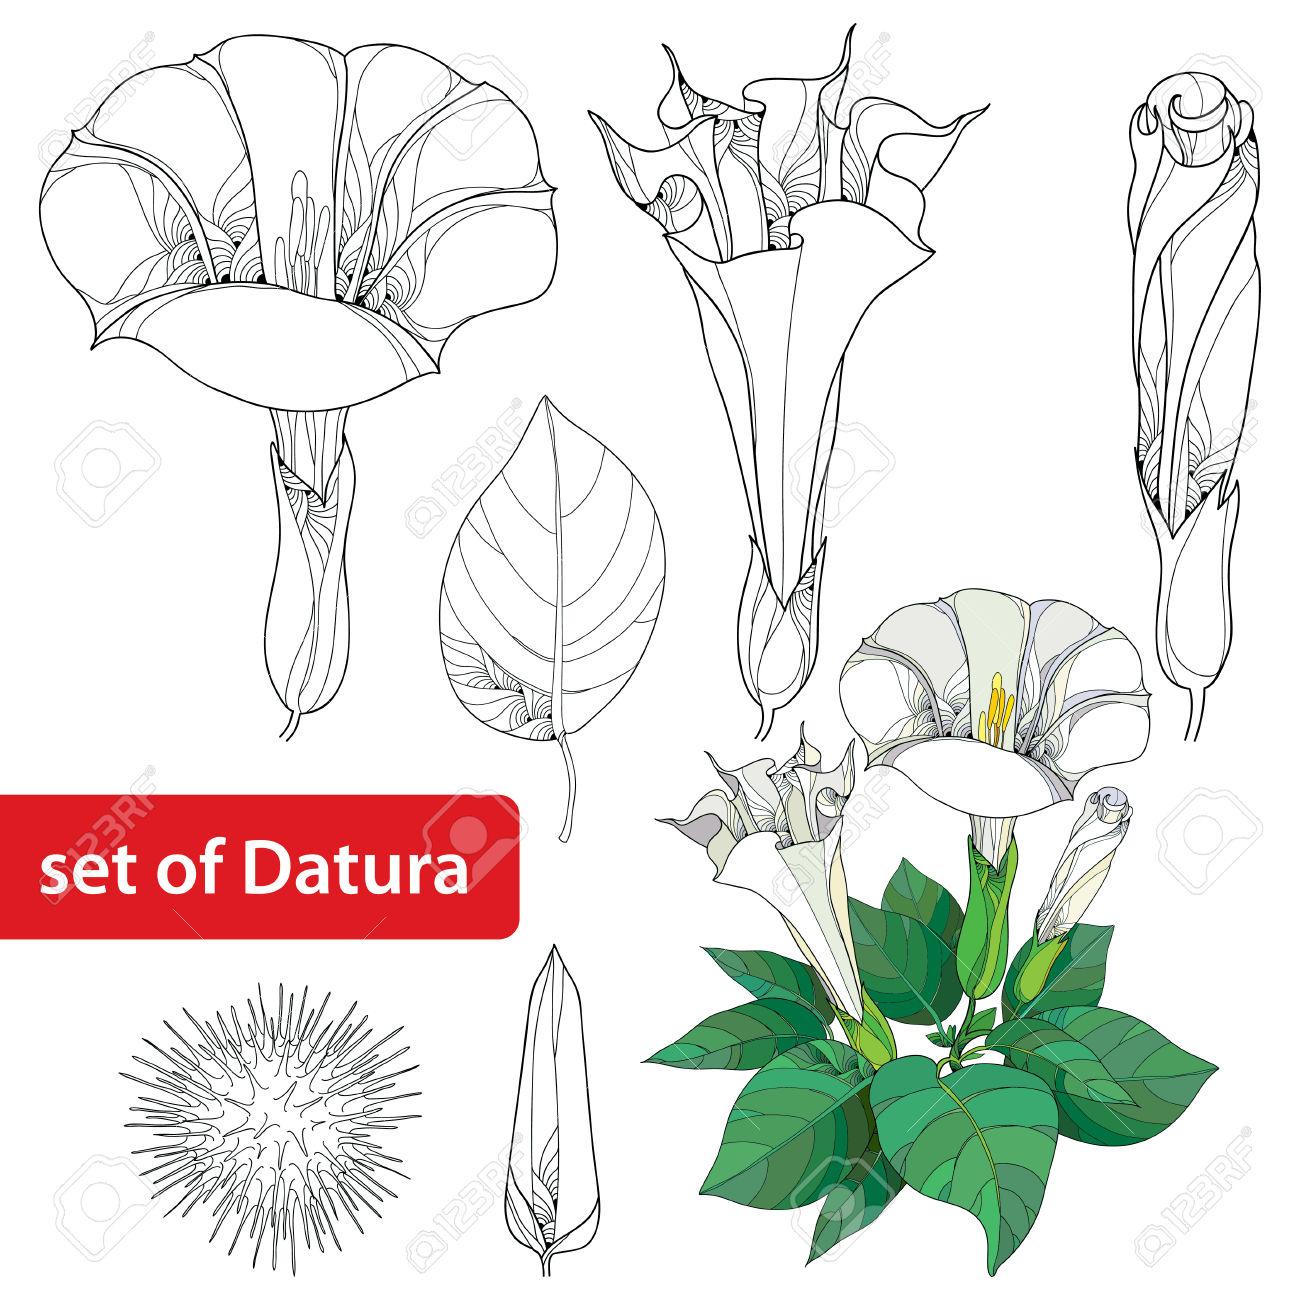 Set With Datura Stramonium Or Thorn Apple. Poisonous Plant. Flower.